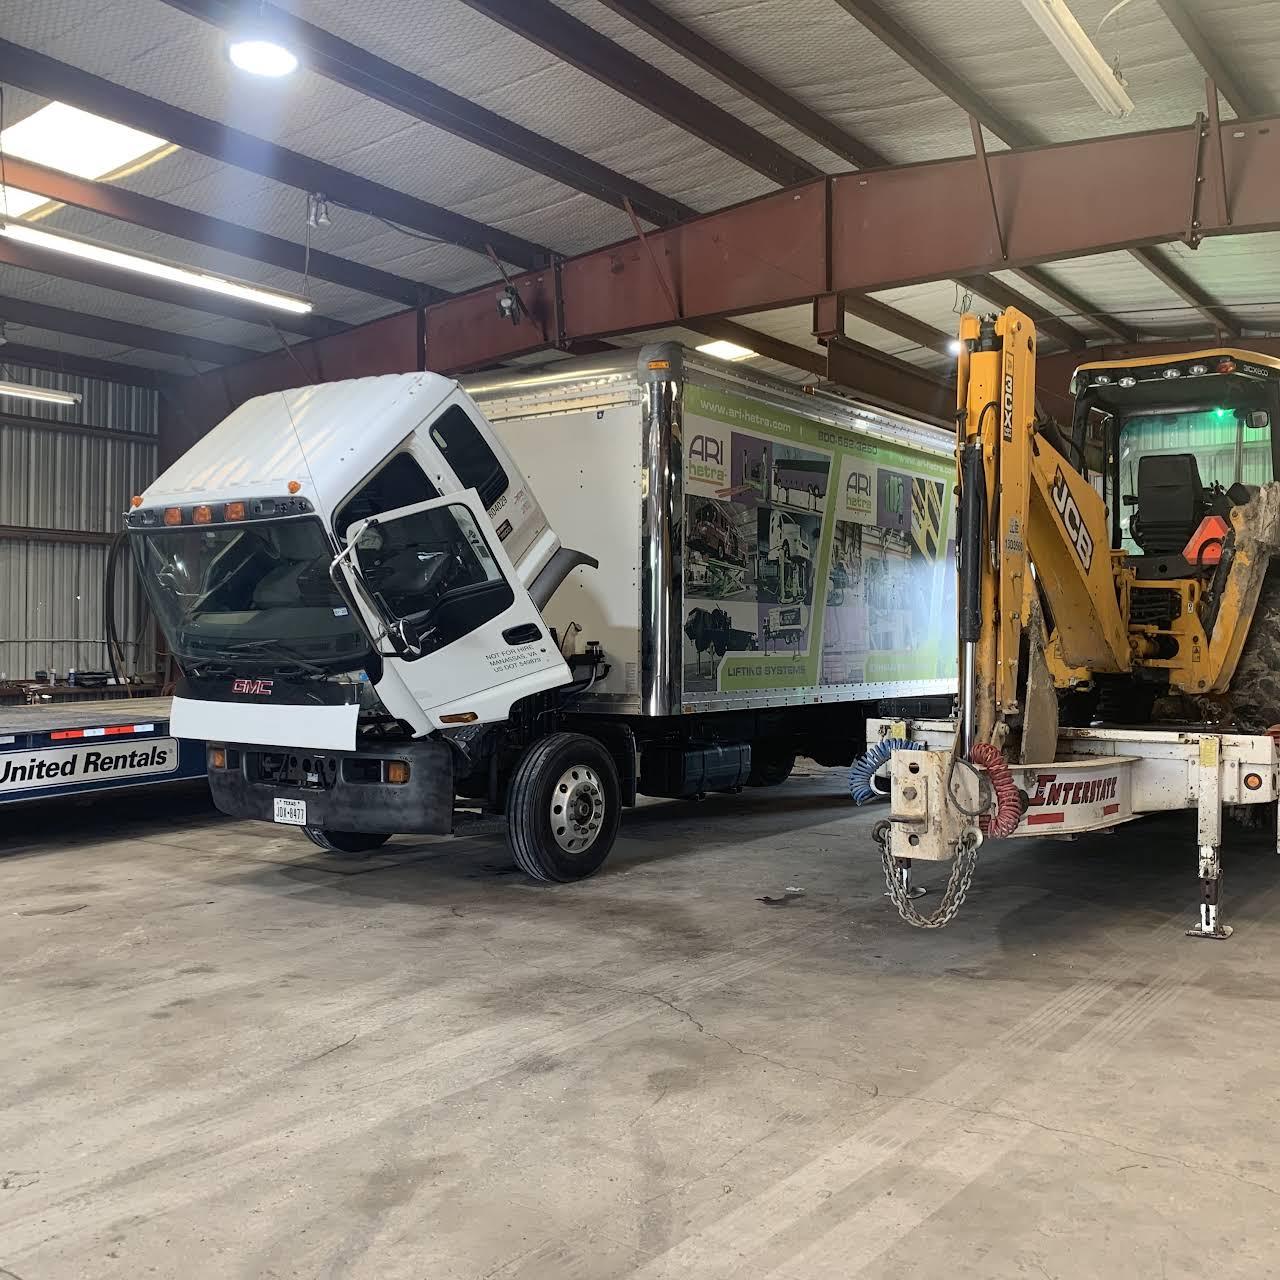 Superior Fleet Solutions - Truck Repair Shop in New Braunfels